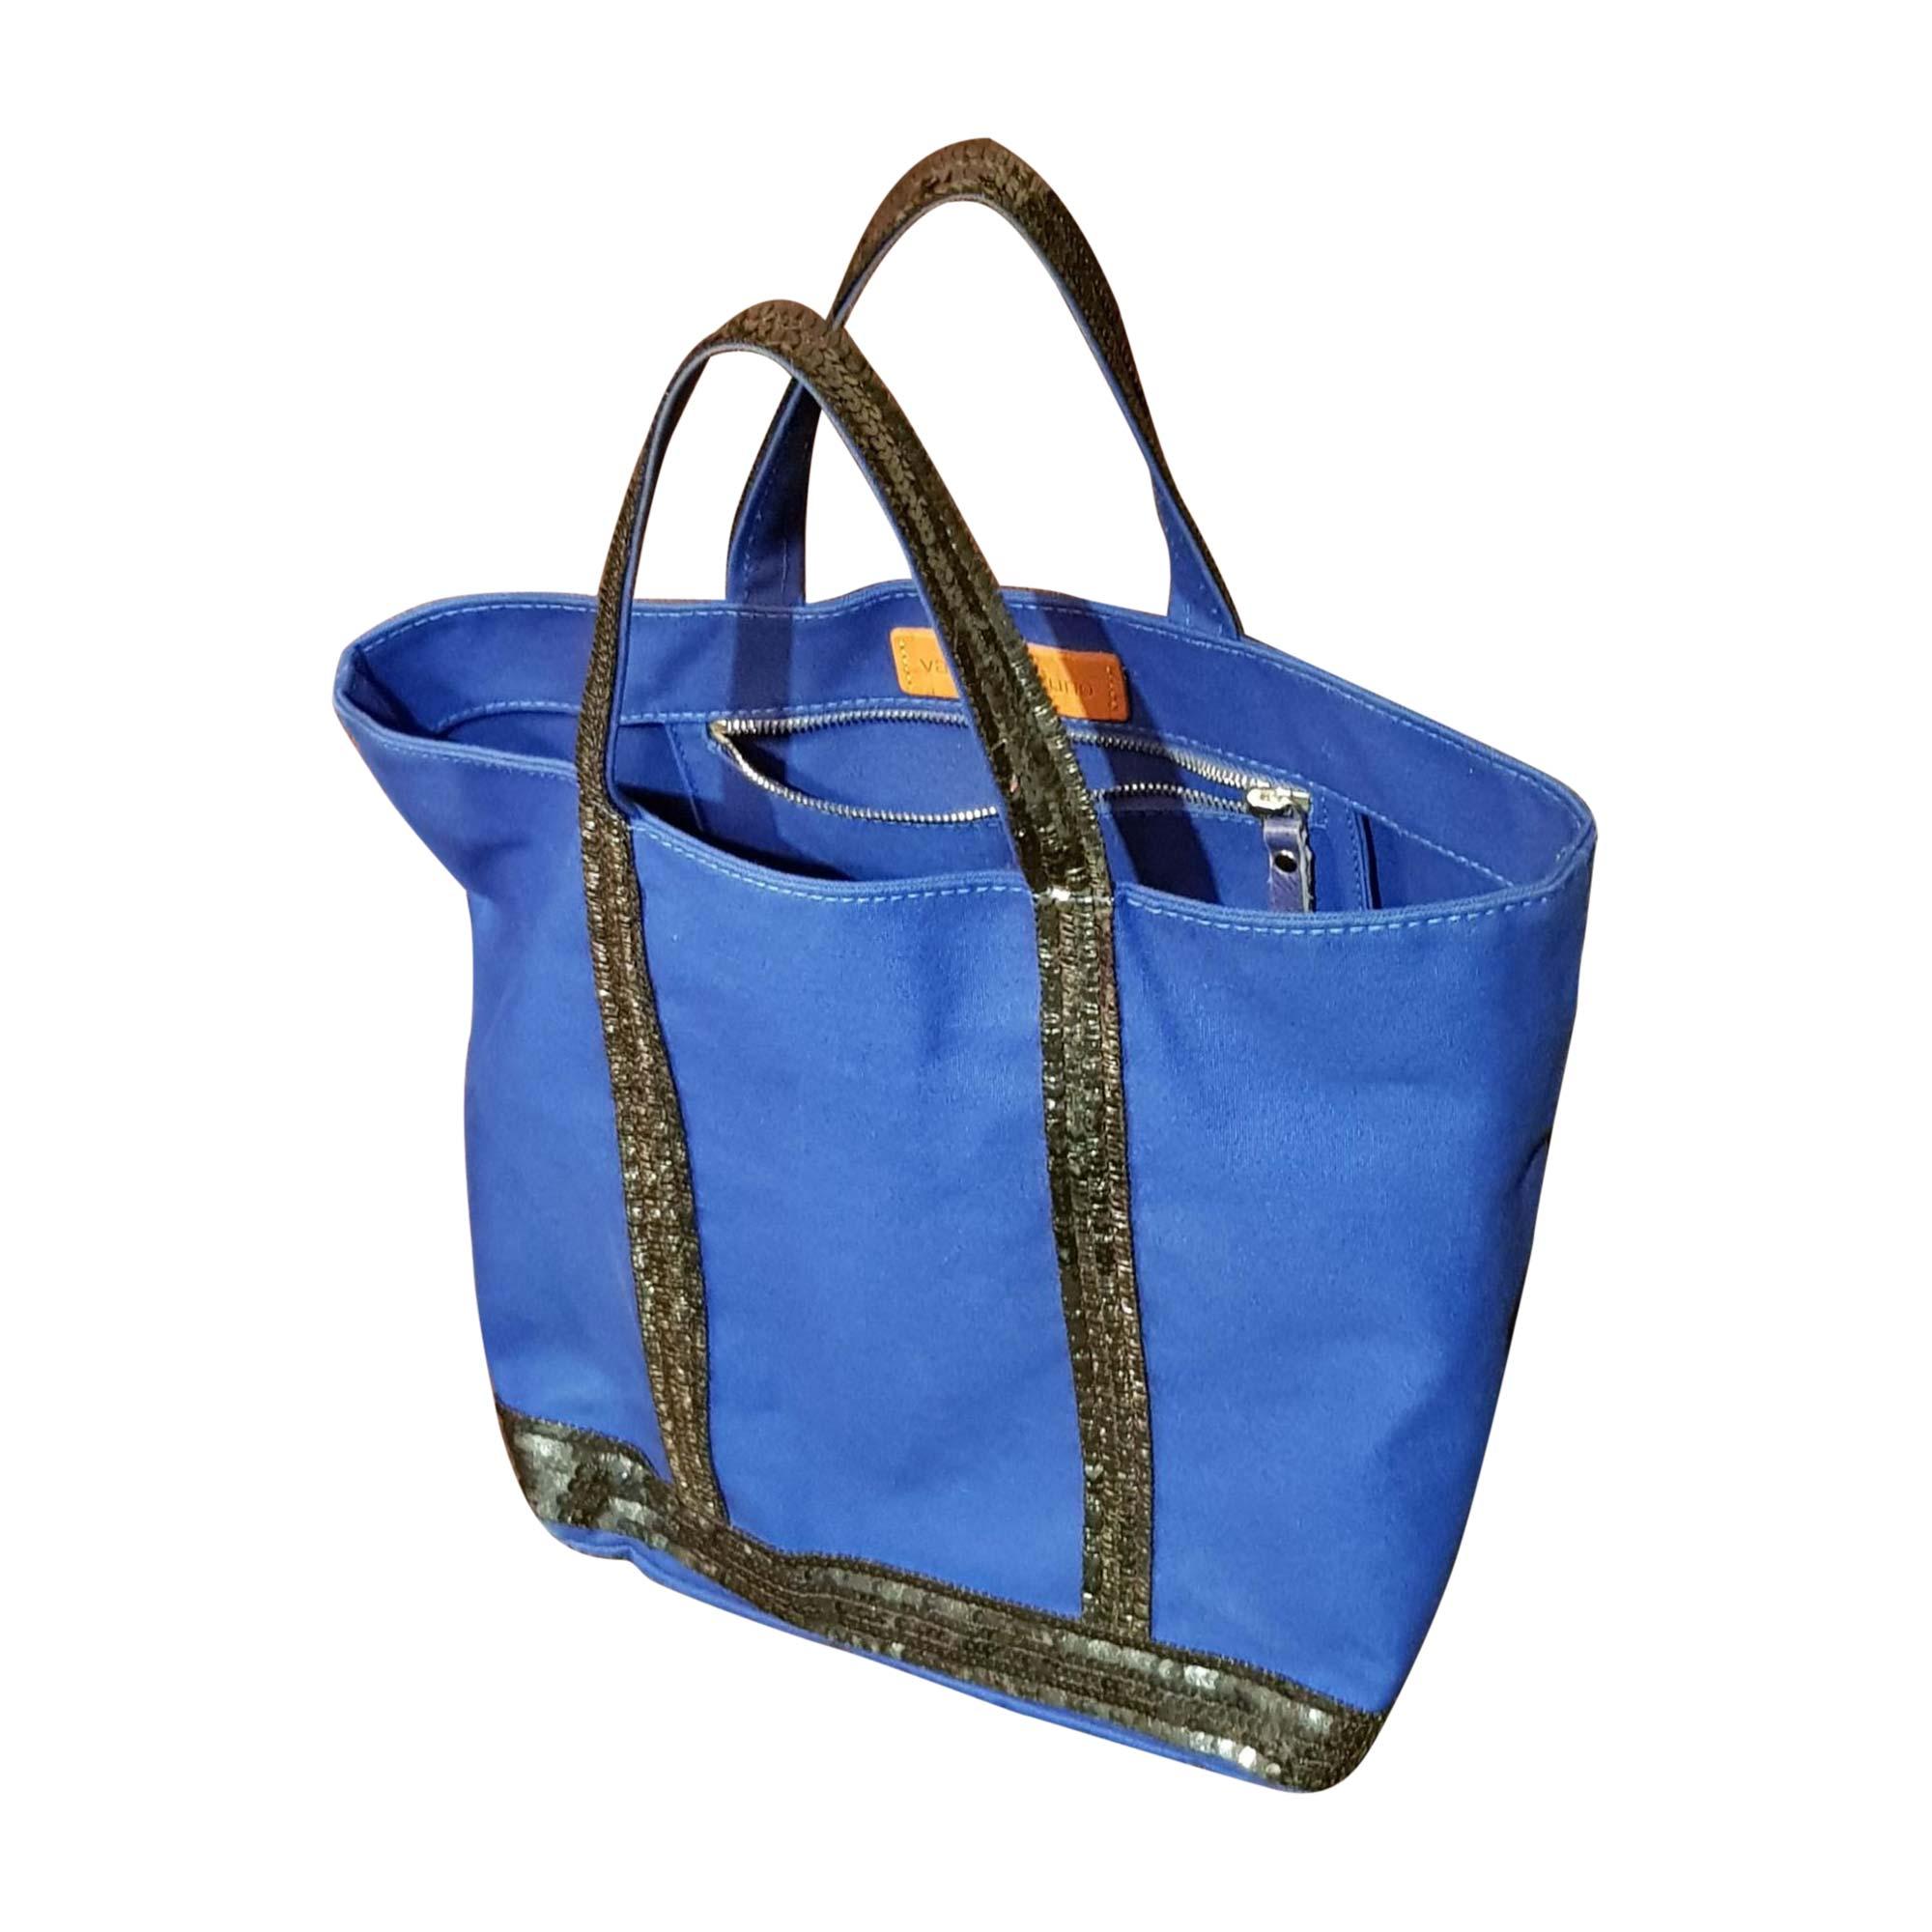 Non-Leather Handbag VANESSA BRUNO Blue, navy, turquoise